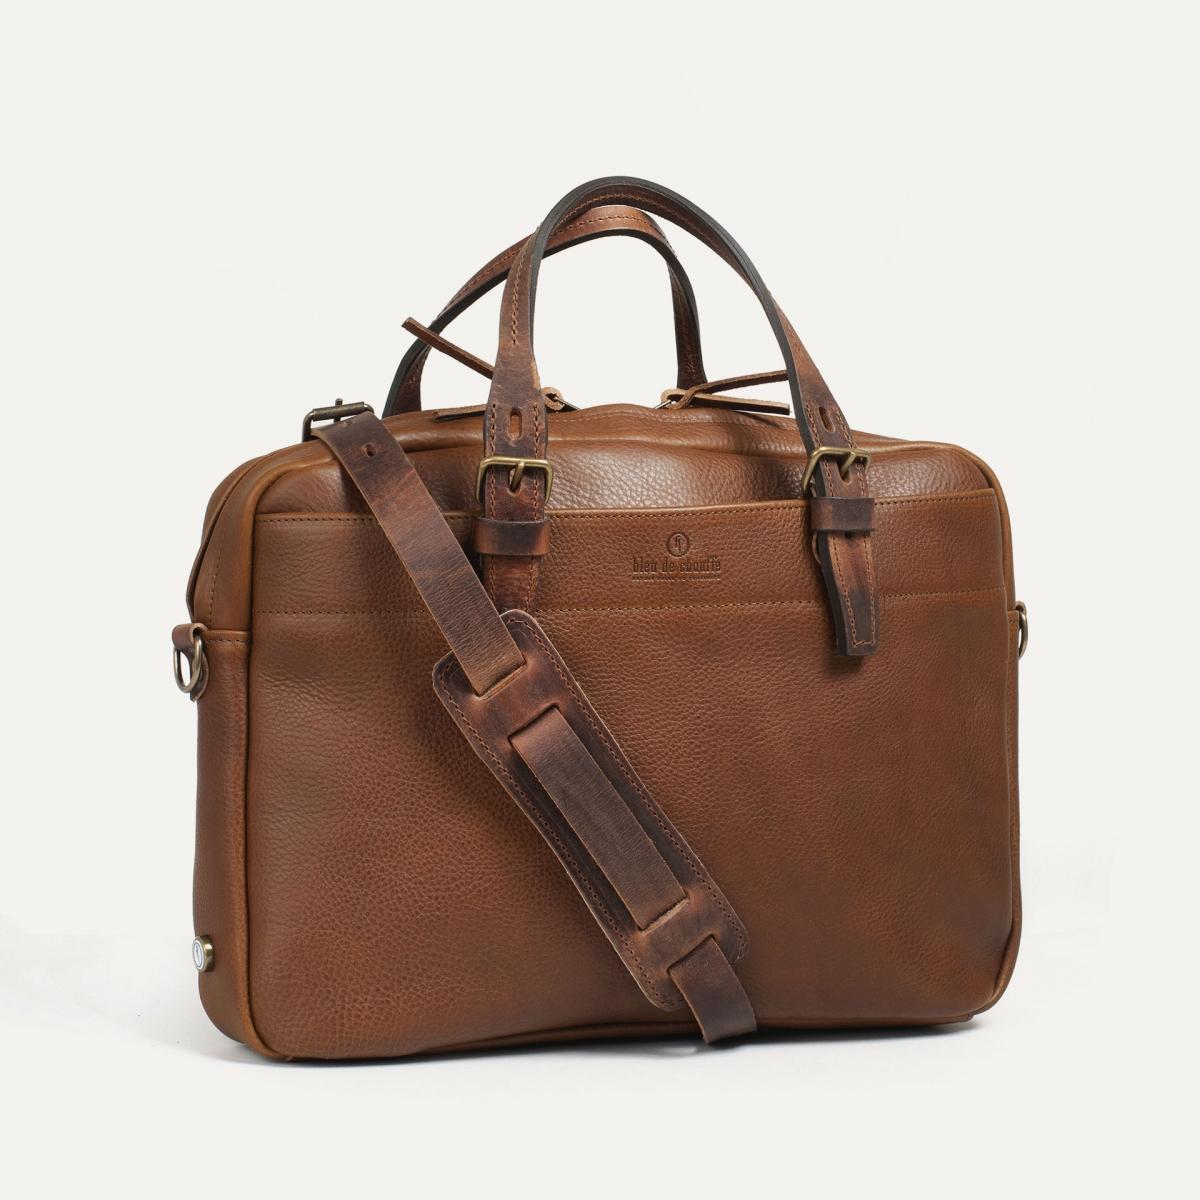 Folder Business bag - Cuba Libre (image n°2)